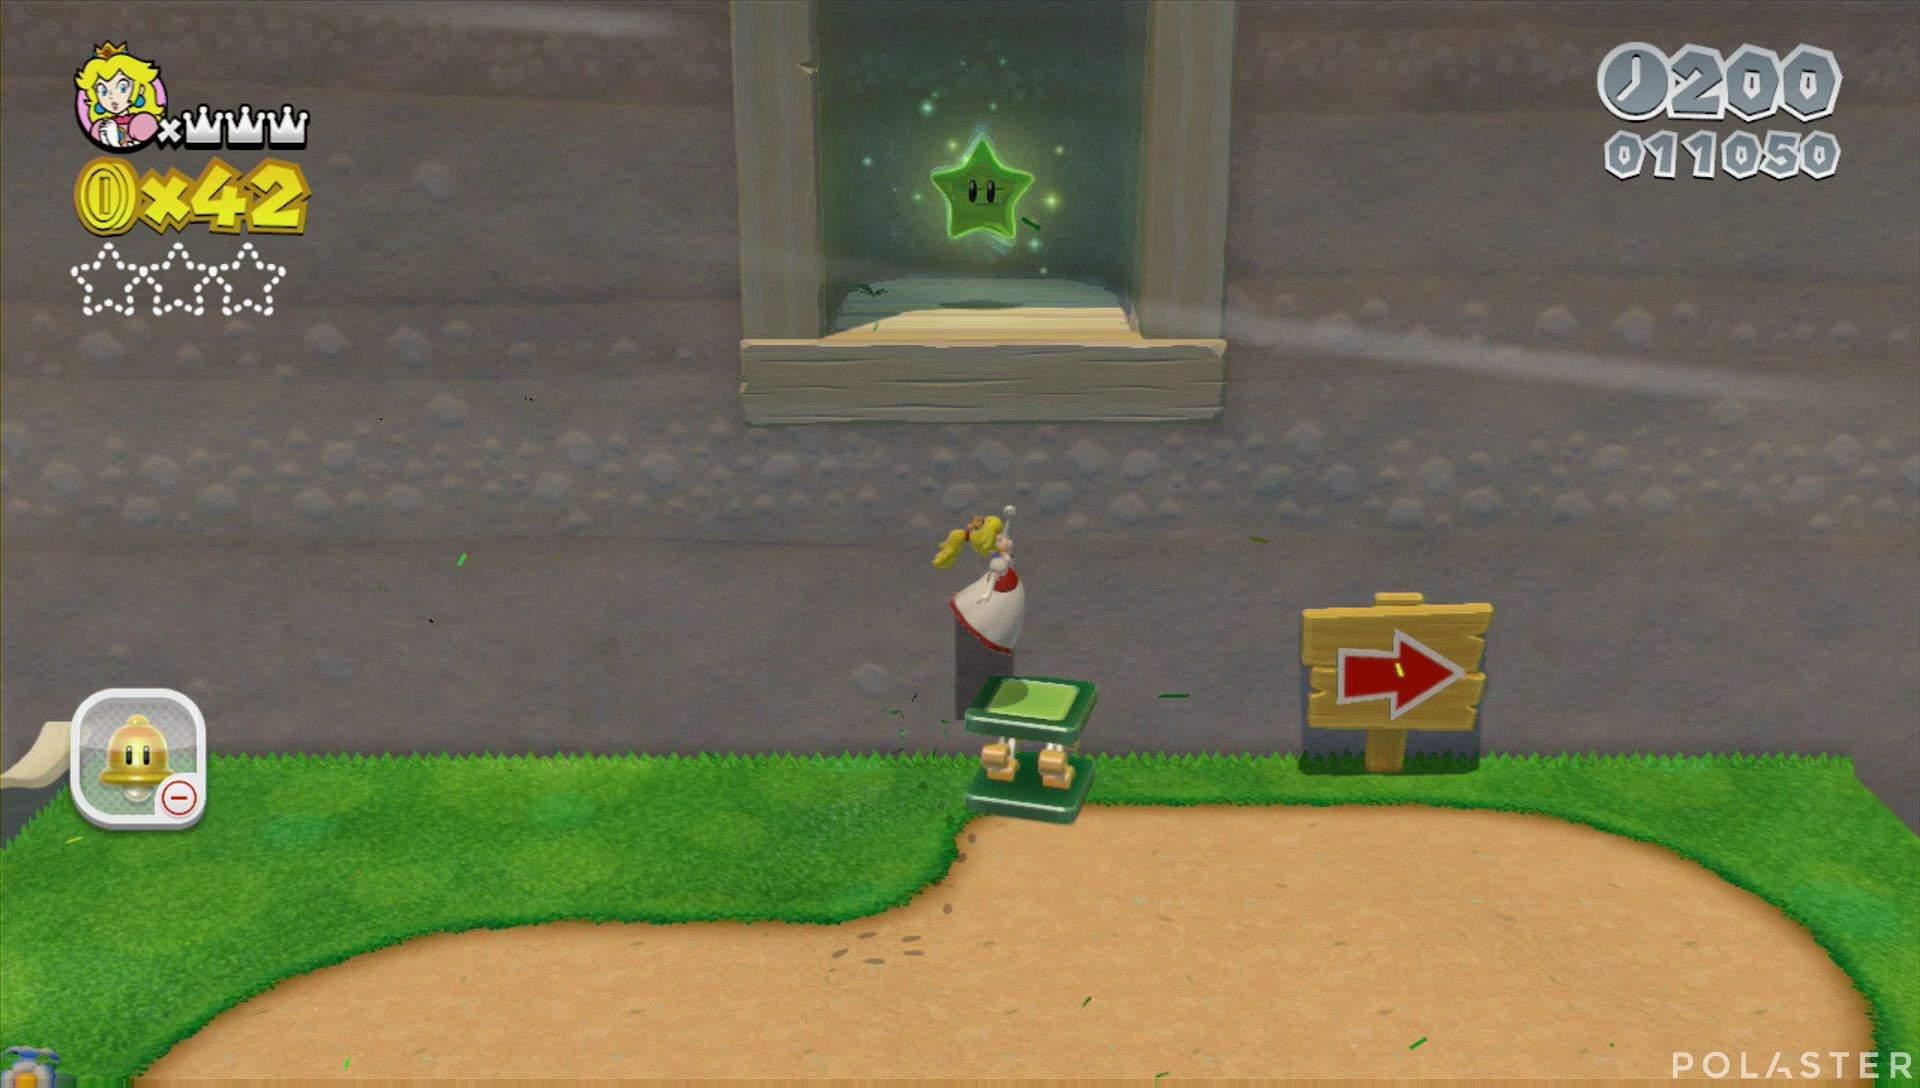 Super Mario 3D World Mundo 4-4 Estrella 1